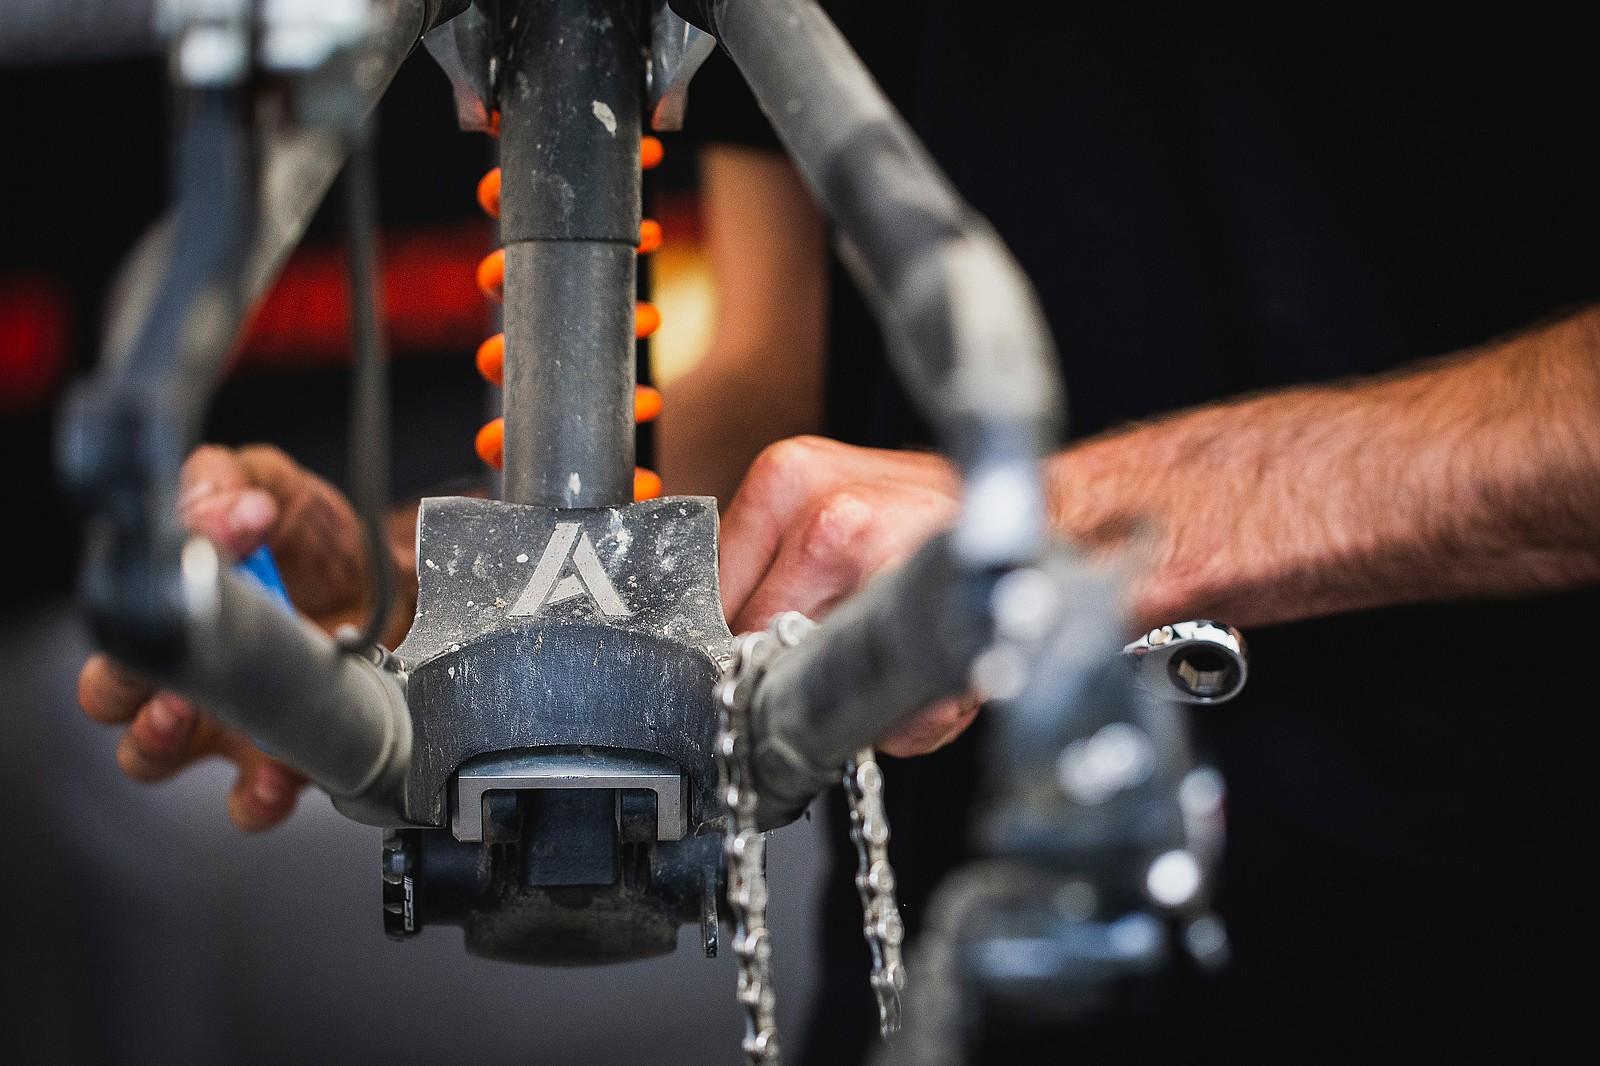 Atherton Prototype Guts - PIT BITS - 2019 Val di Sole World Cup Downhill Bike Tech - Mountain Biking Pictures - Vital MTB